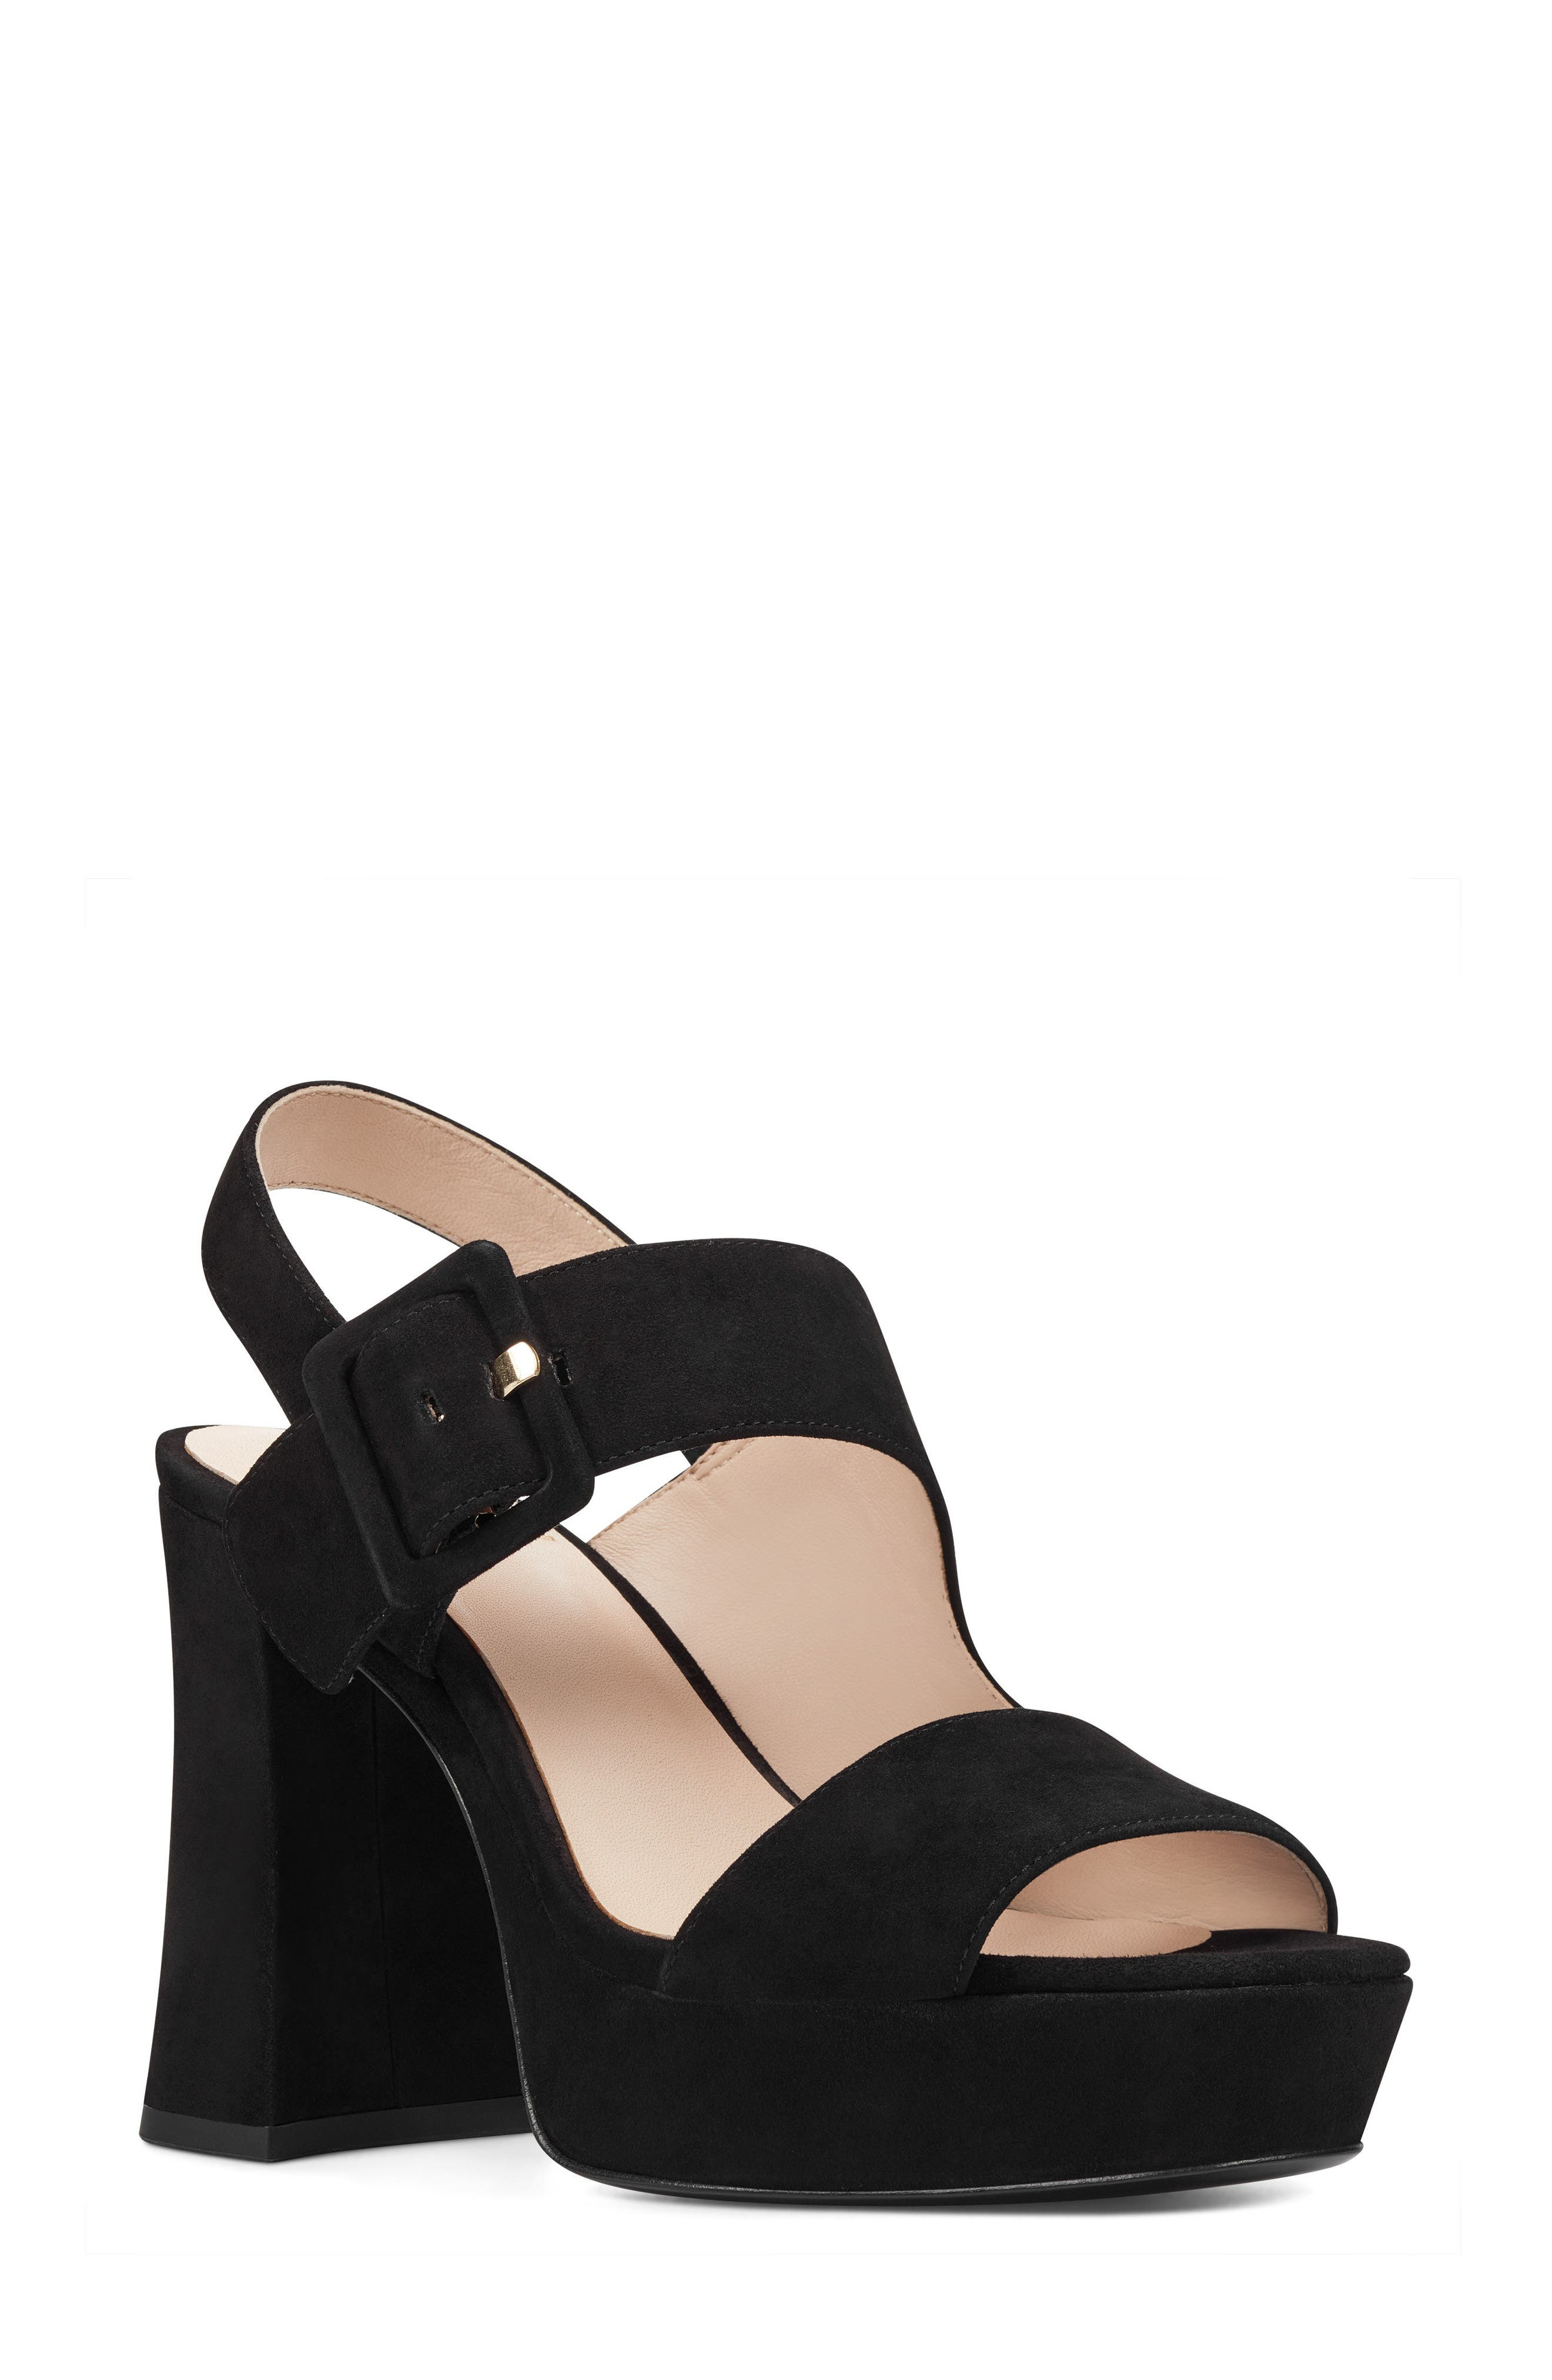 Lexine - 40th Anniversary Capsule Collection Platform Sandal,                         Main,                         color, 001